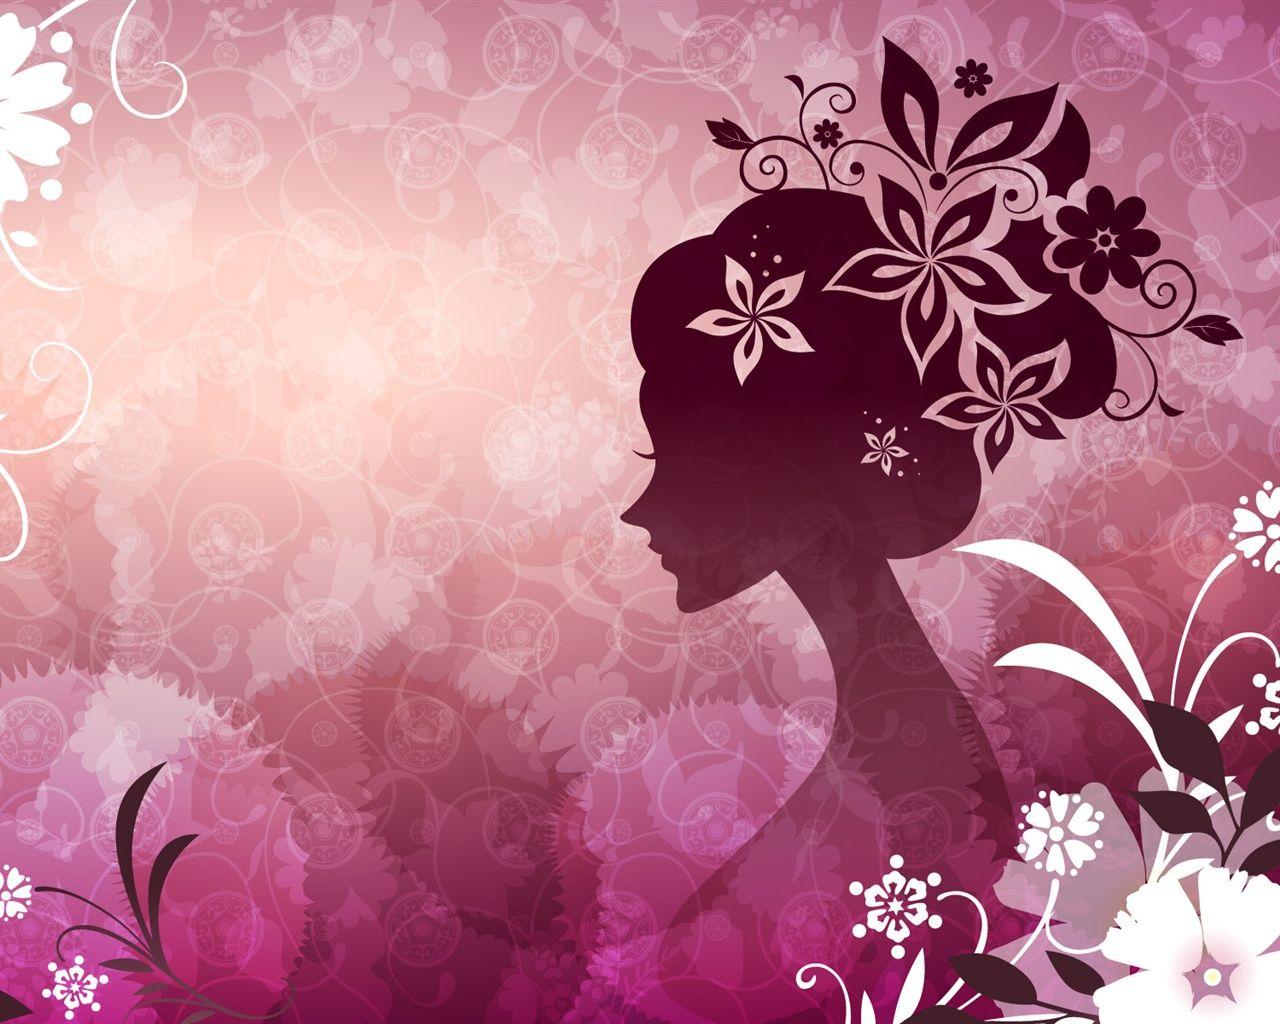 Vector woman with pink flowers, wallpaper Digital art